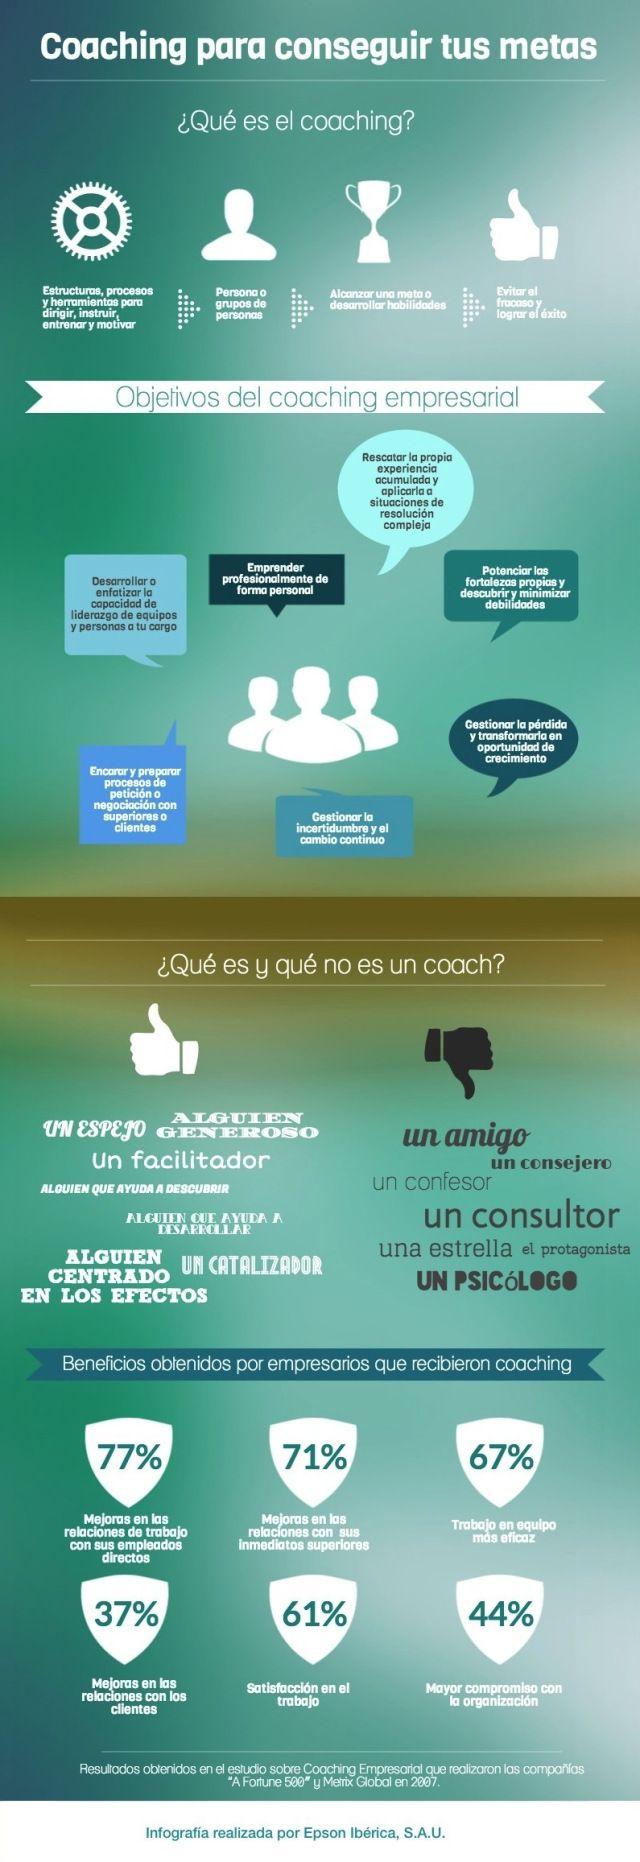 Coaching para conseguir tus metas #infografia #infographic #education